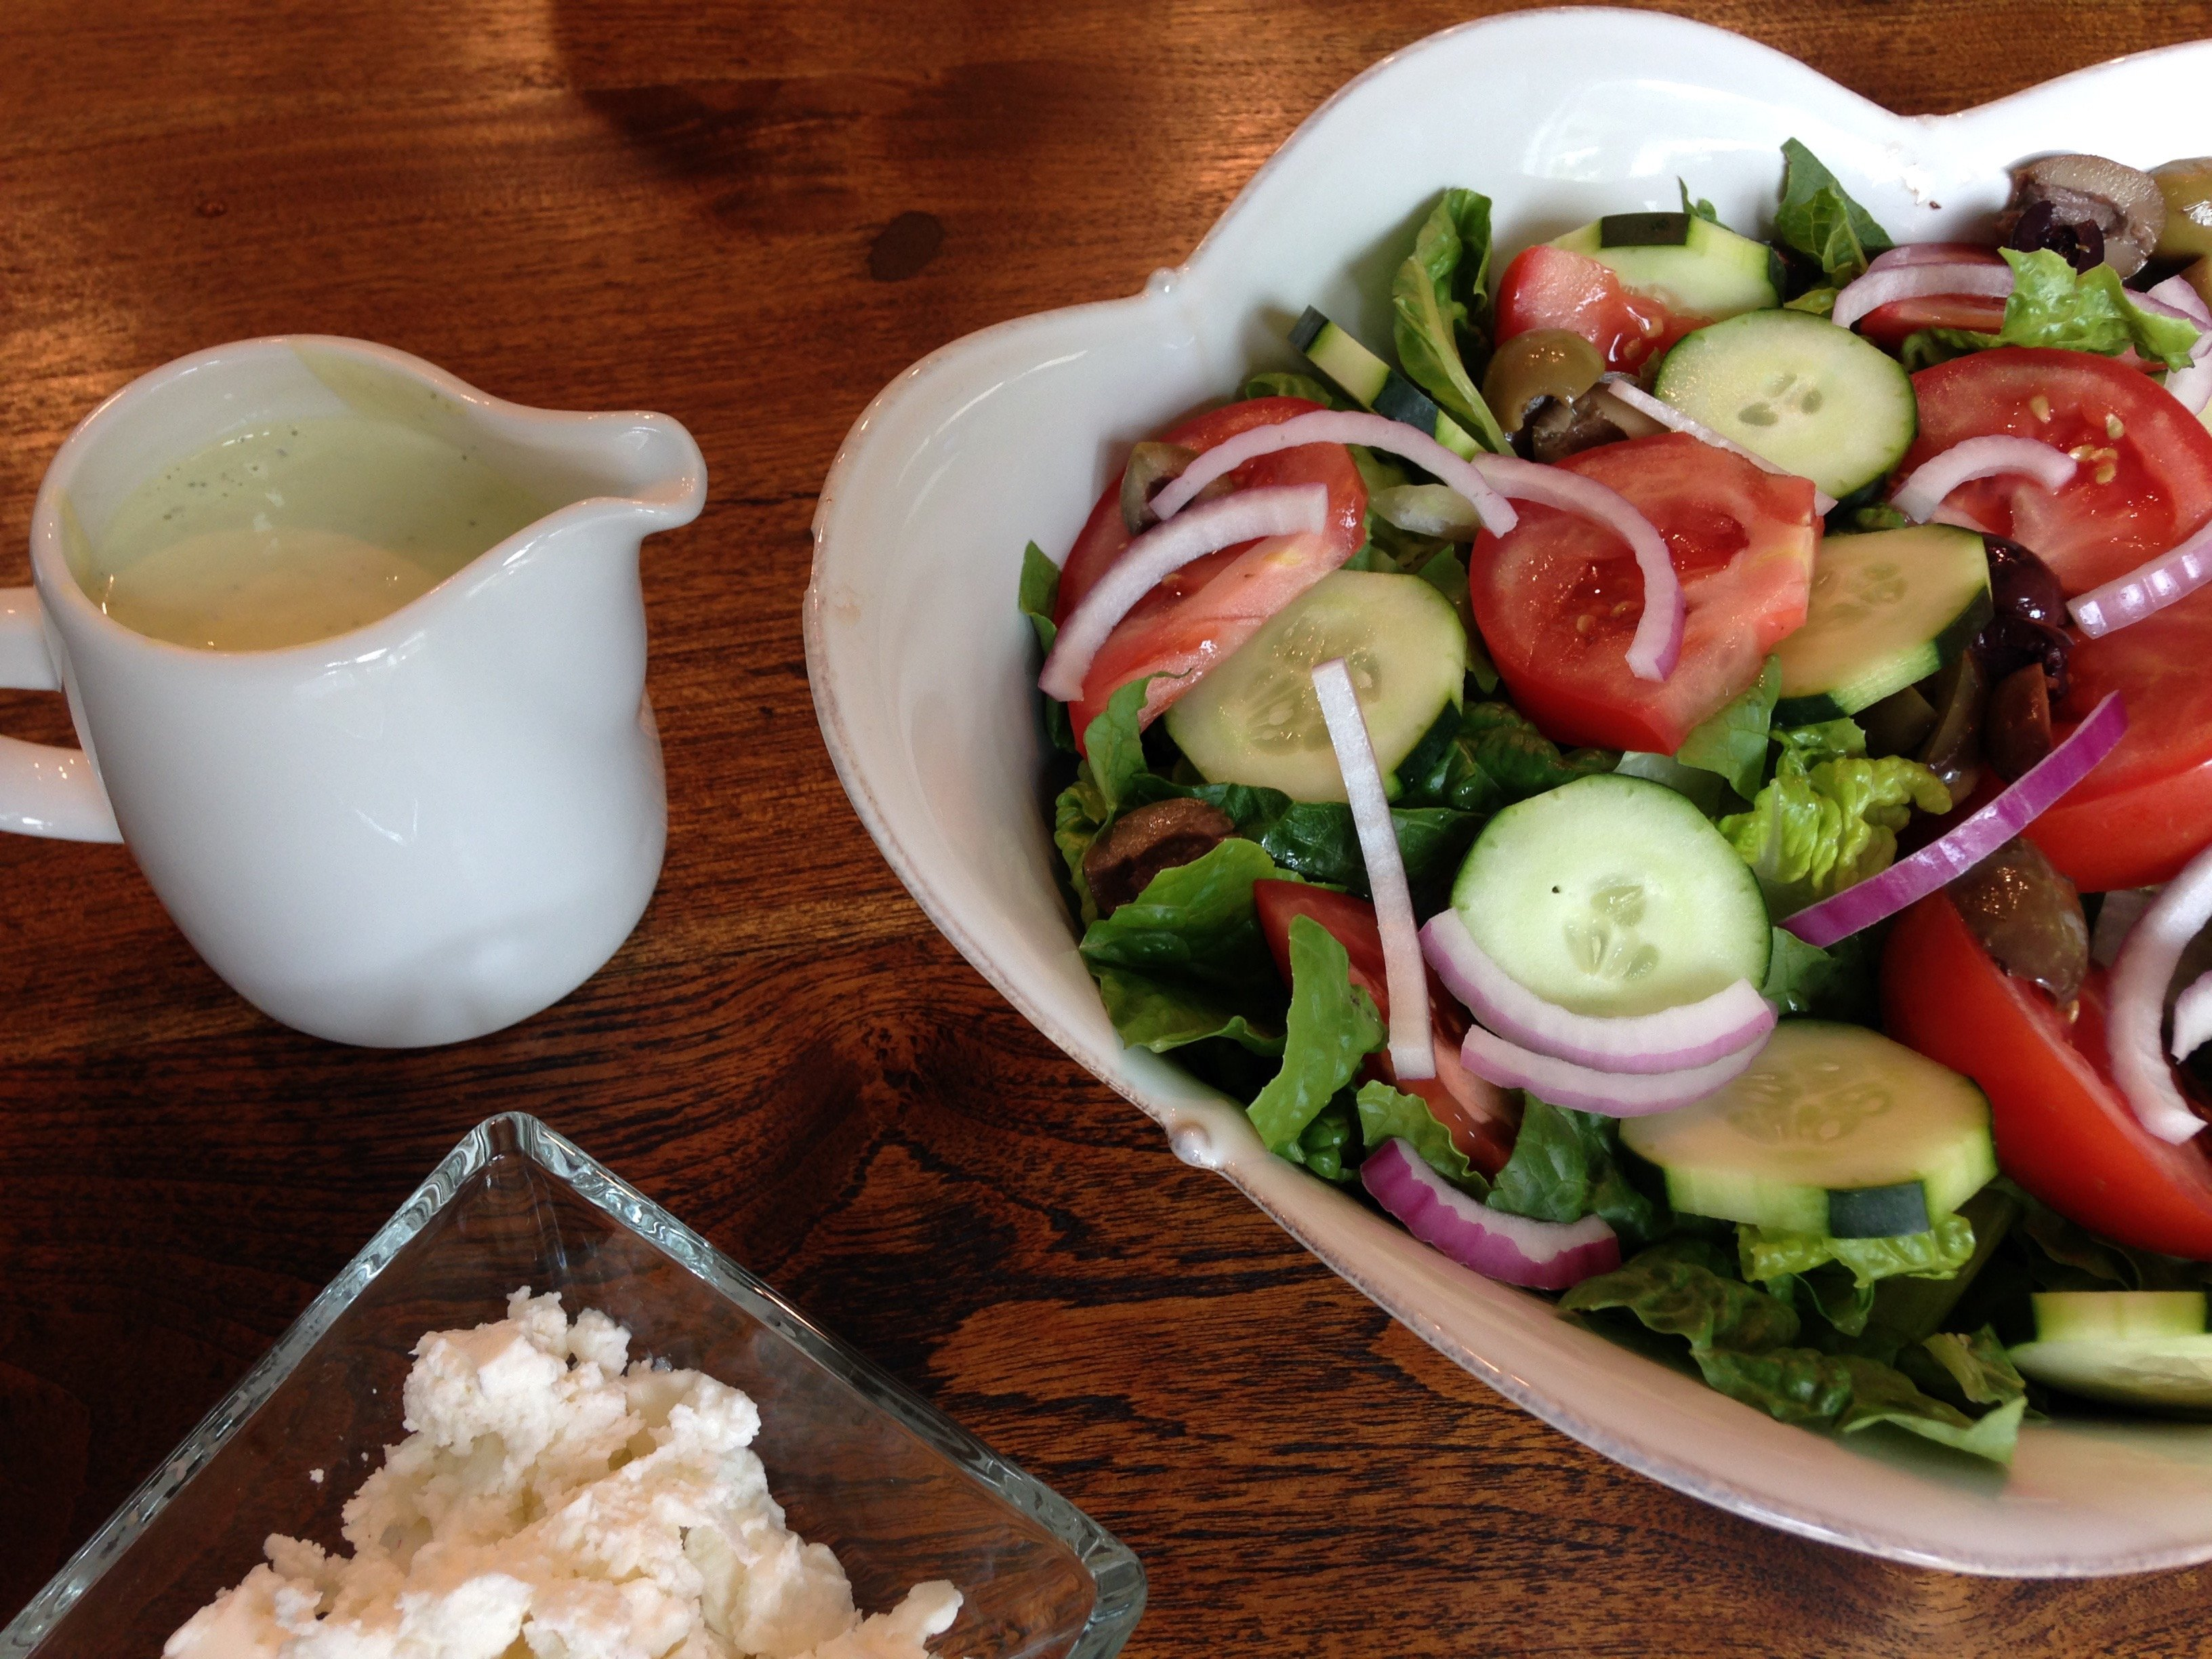 Greek Salad with Creamy Cashew-Dill Dressing